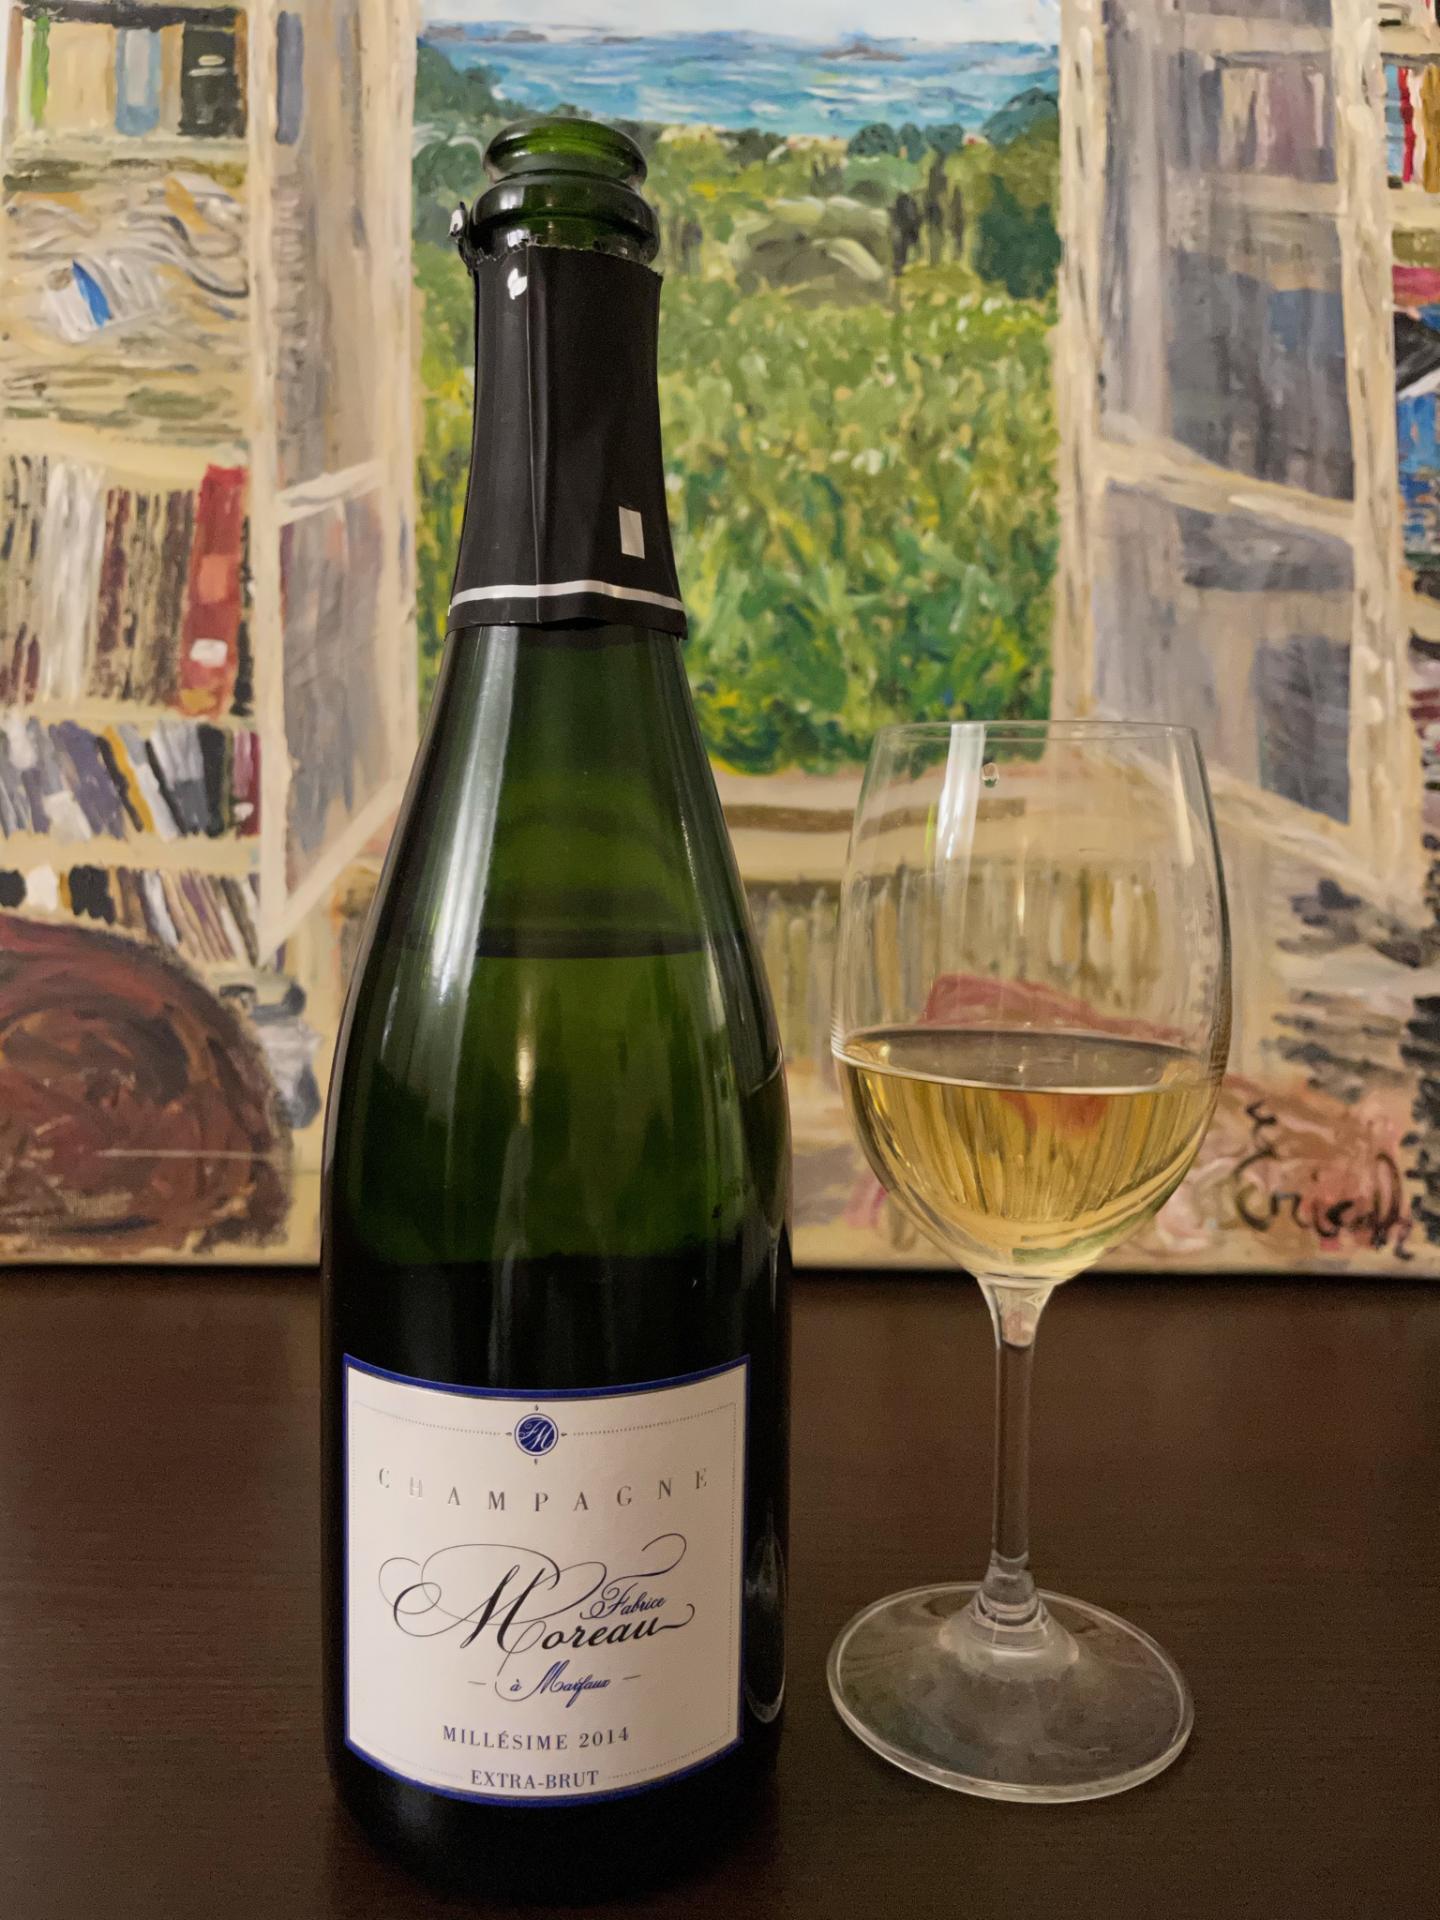 Champagne fabrice moreau extra brut millesime 2014